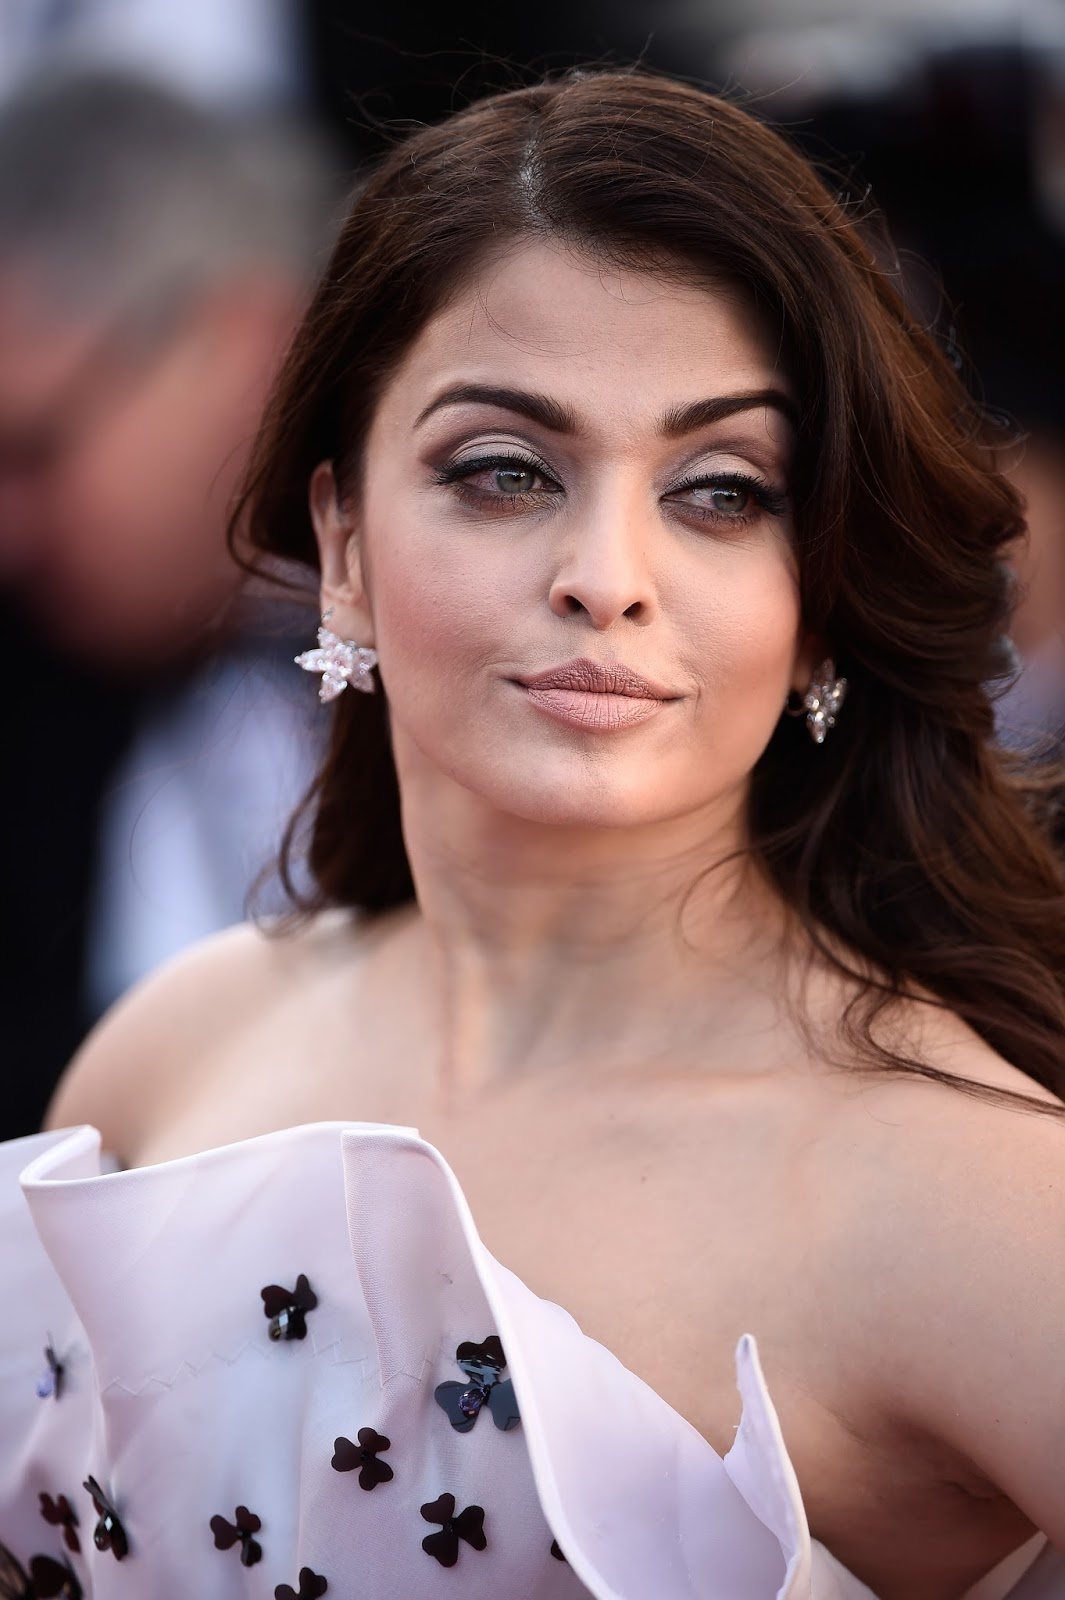 high quality bollywood celebrity pictures aishwarya rai bachchan